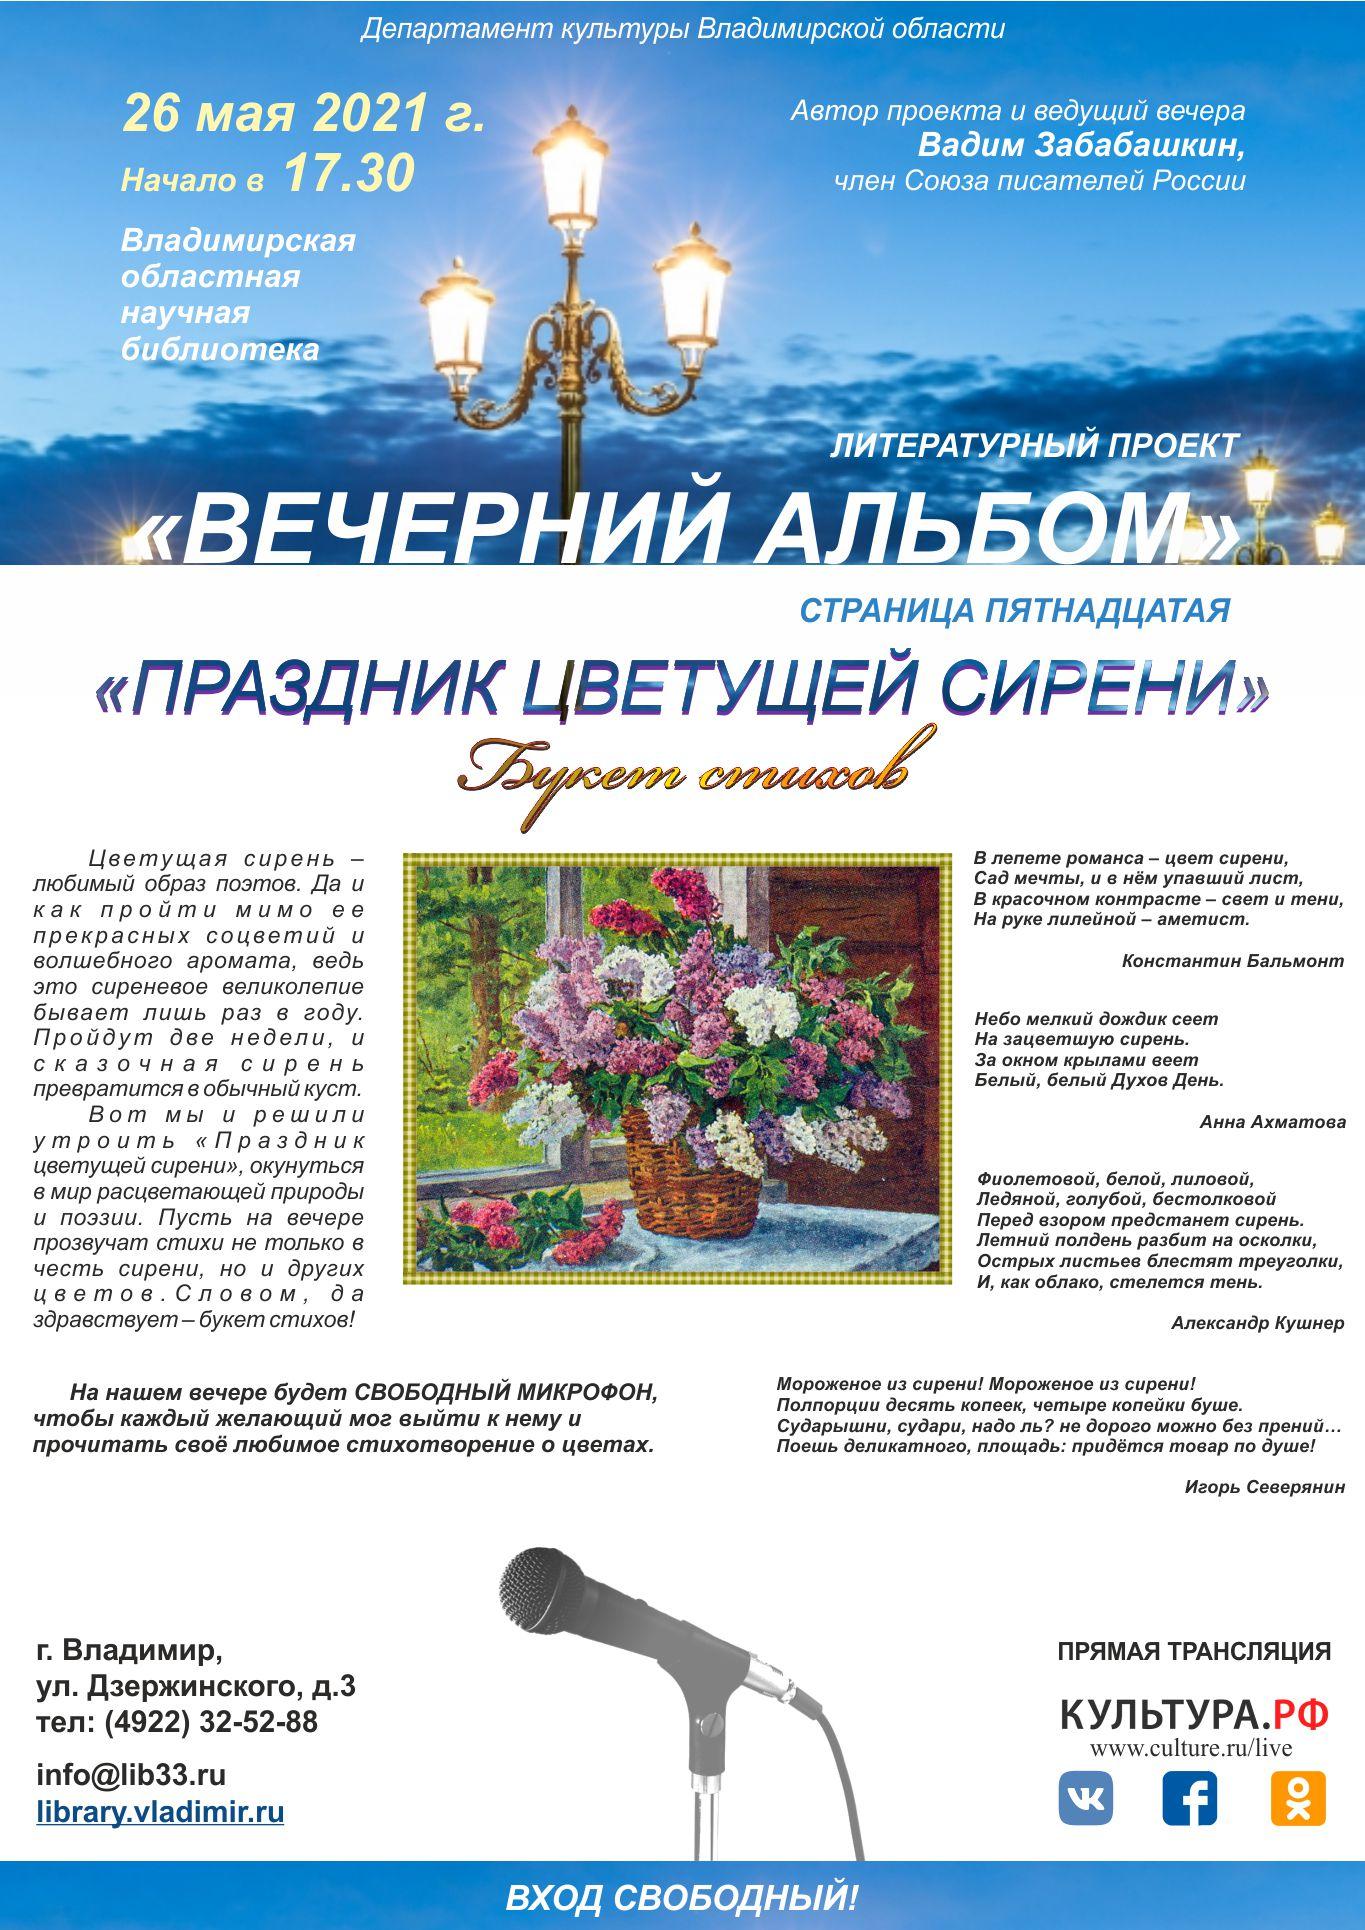 Праздник цветущей сирени Афиша мероприятия